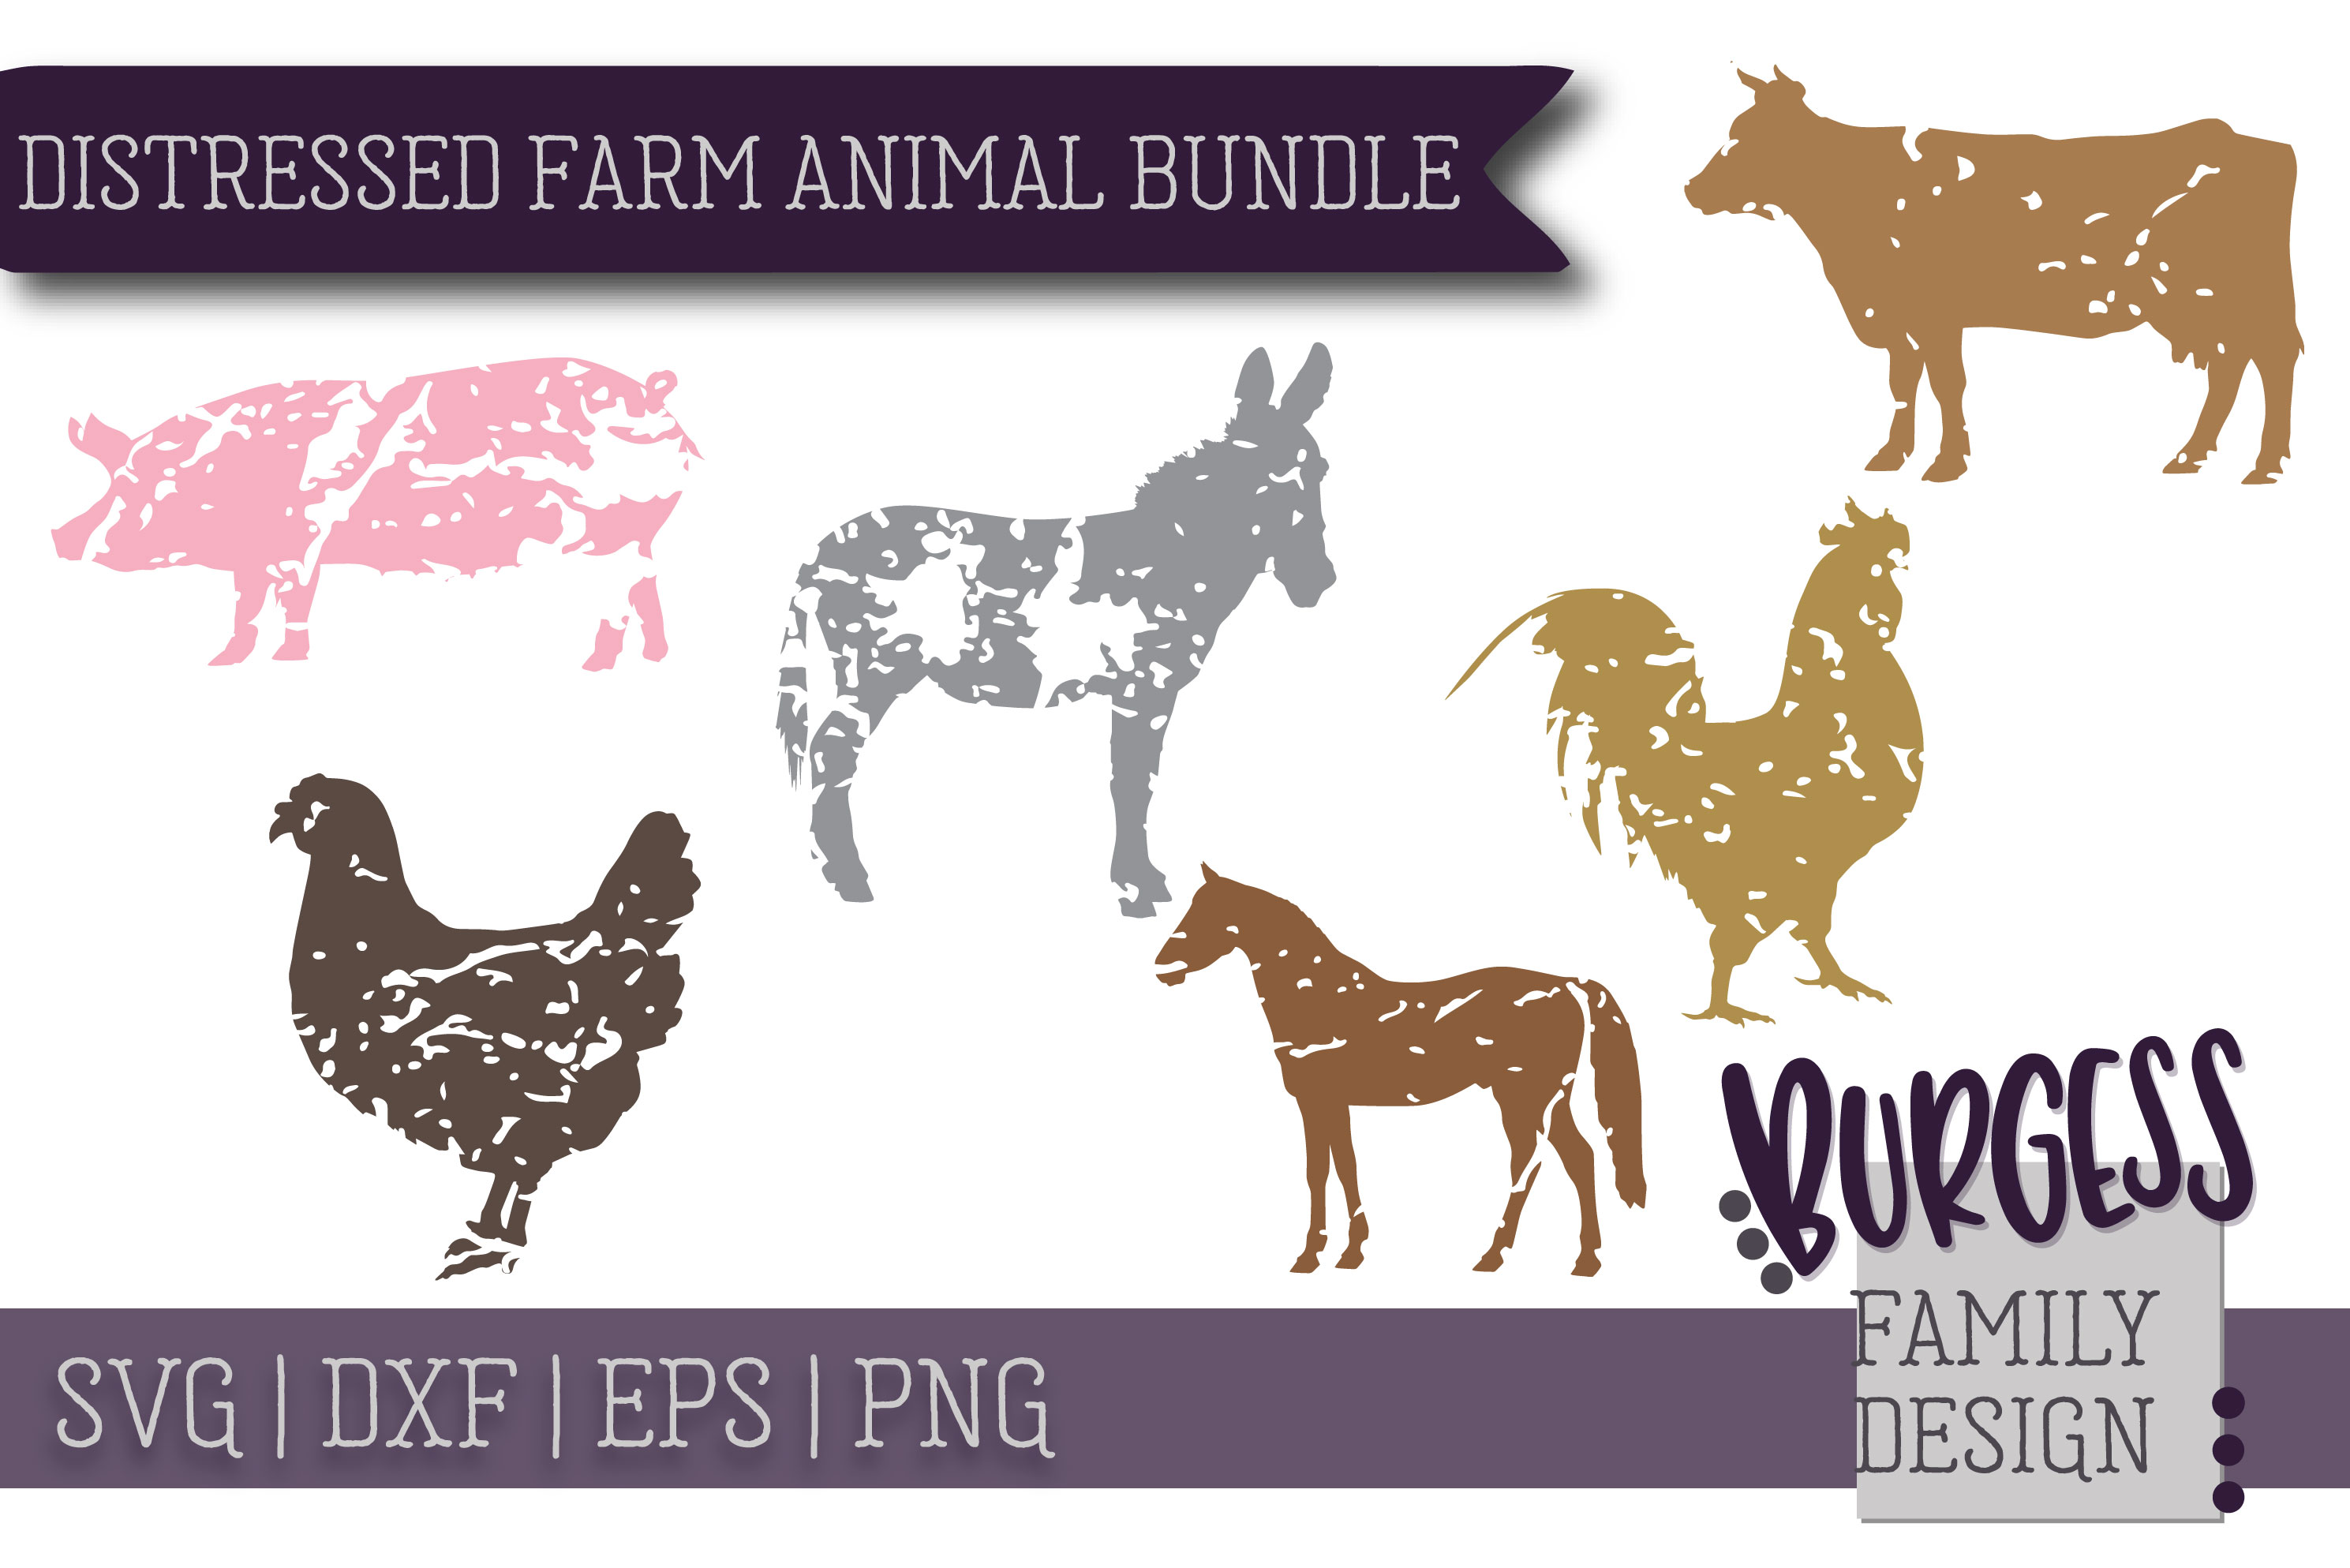 The starter bundle - Over 200 Designs | SVG DXF EPS PNG example image 13